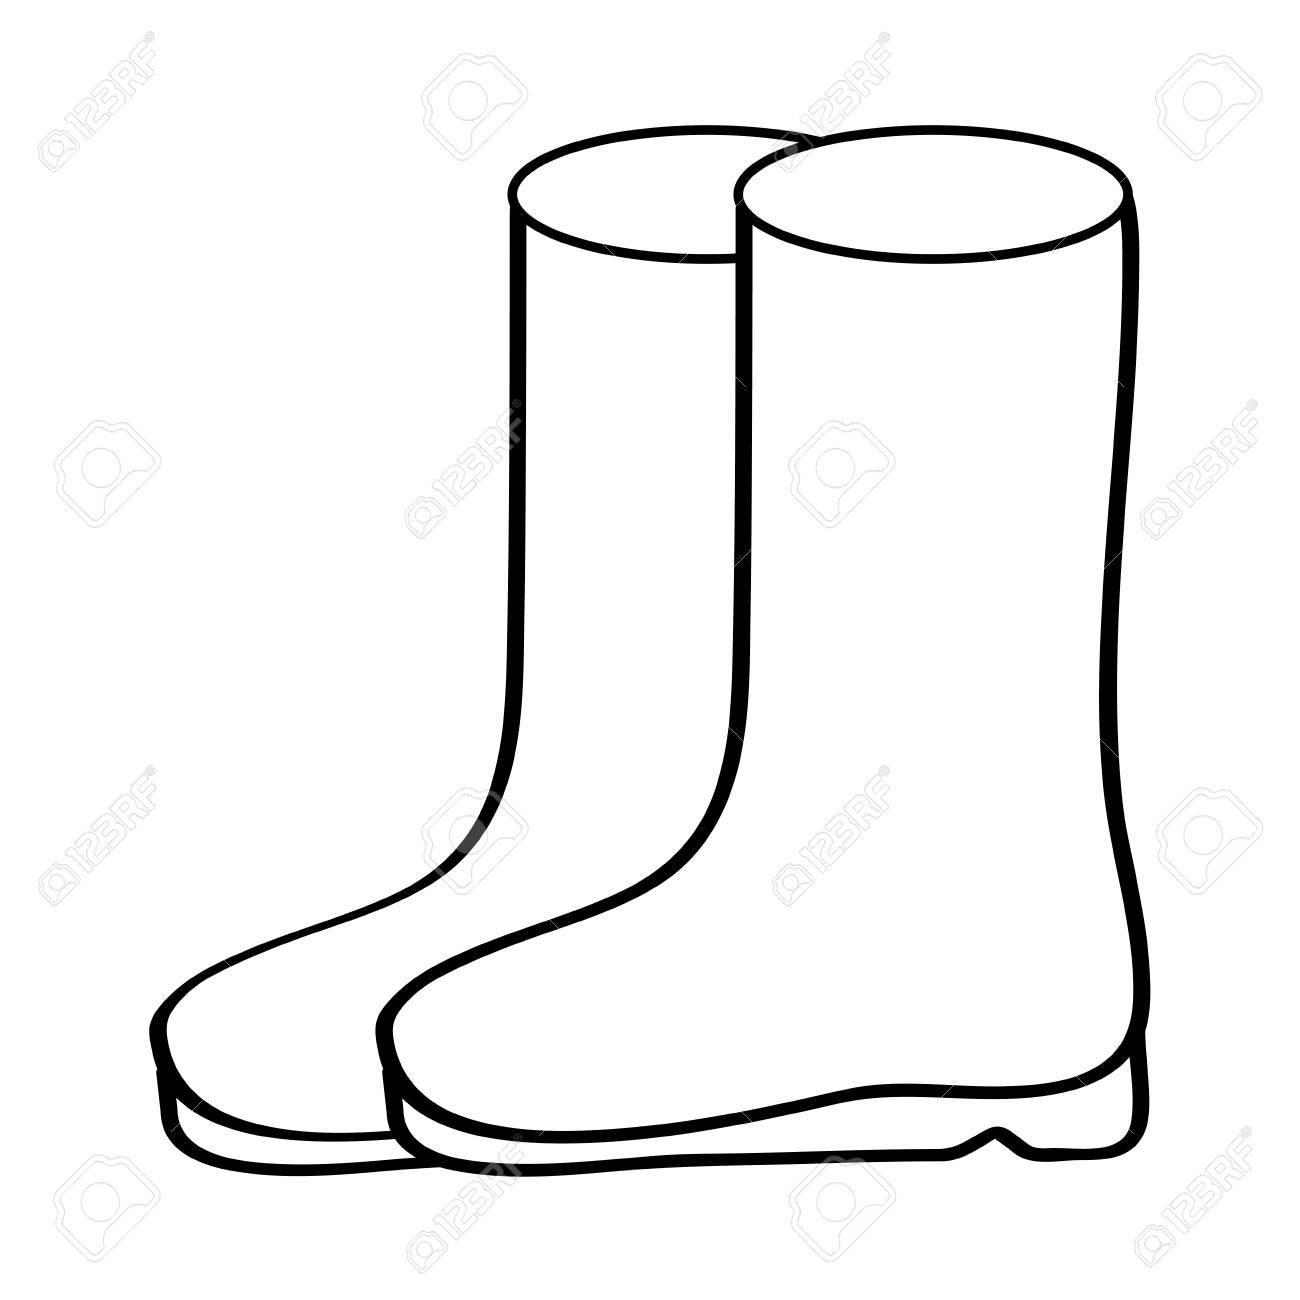 pair rubber boots clothes winter season fashion vector illustration outline design - 96527846